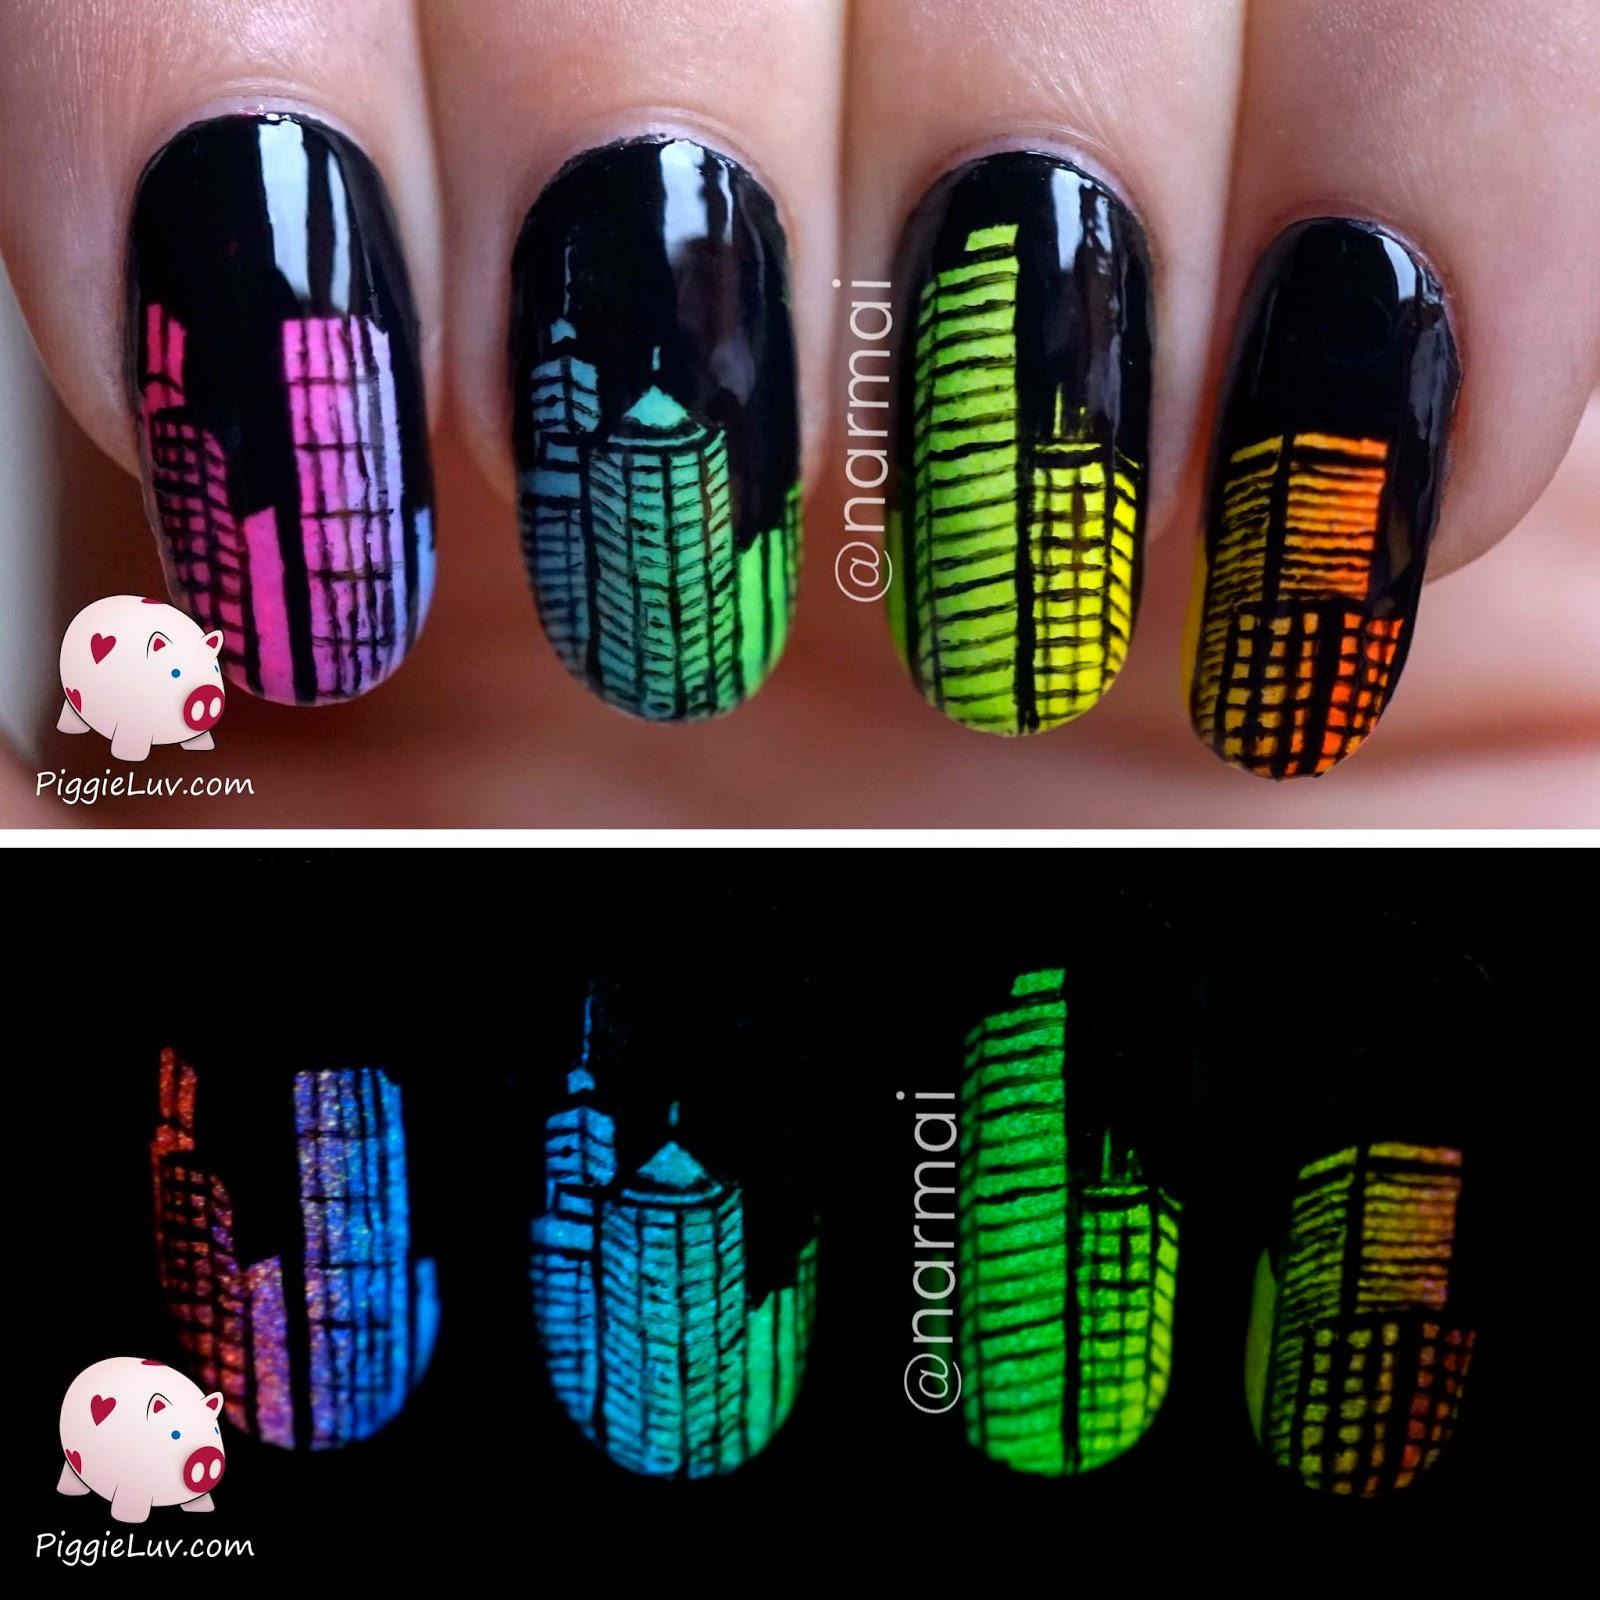 PiggieLuv: Glow in the dark city skyline nail art